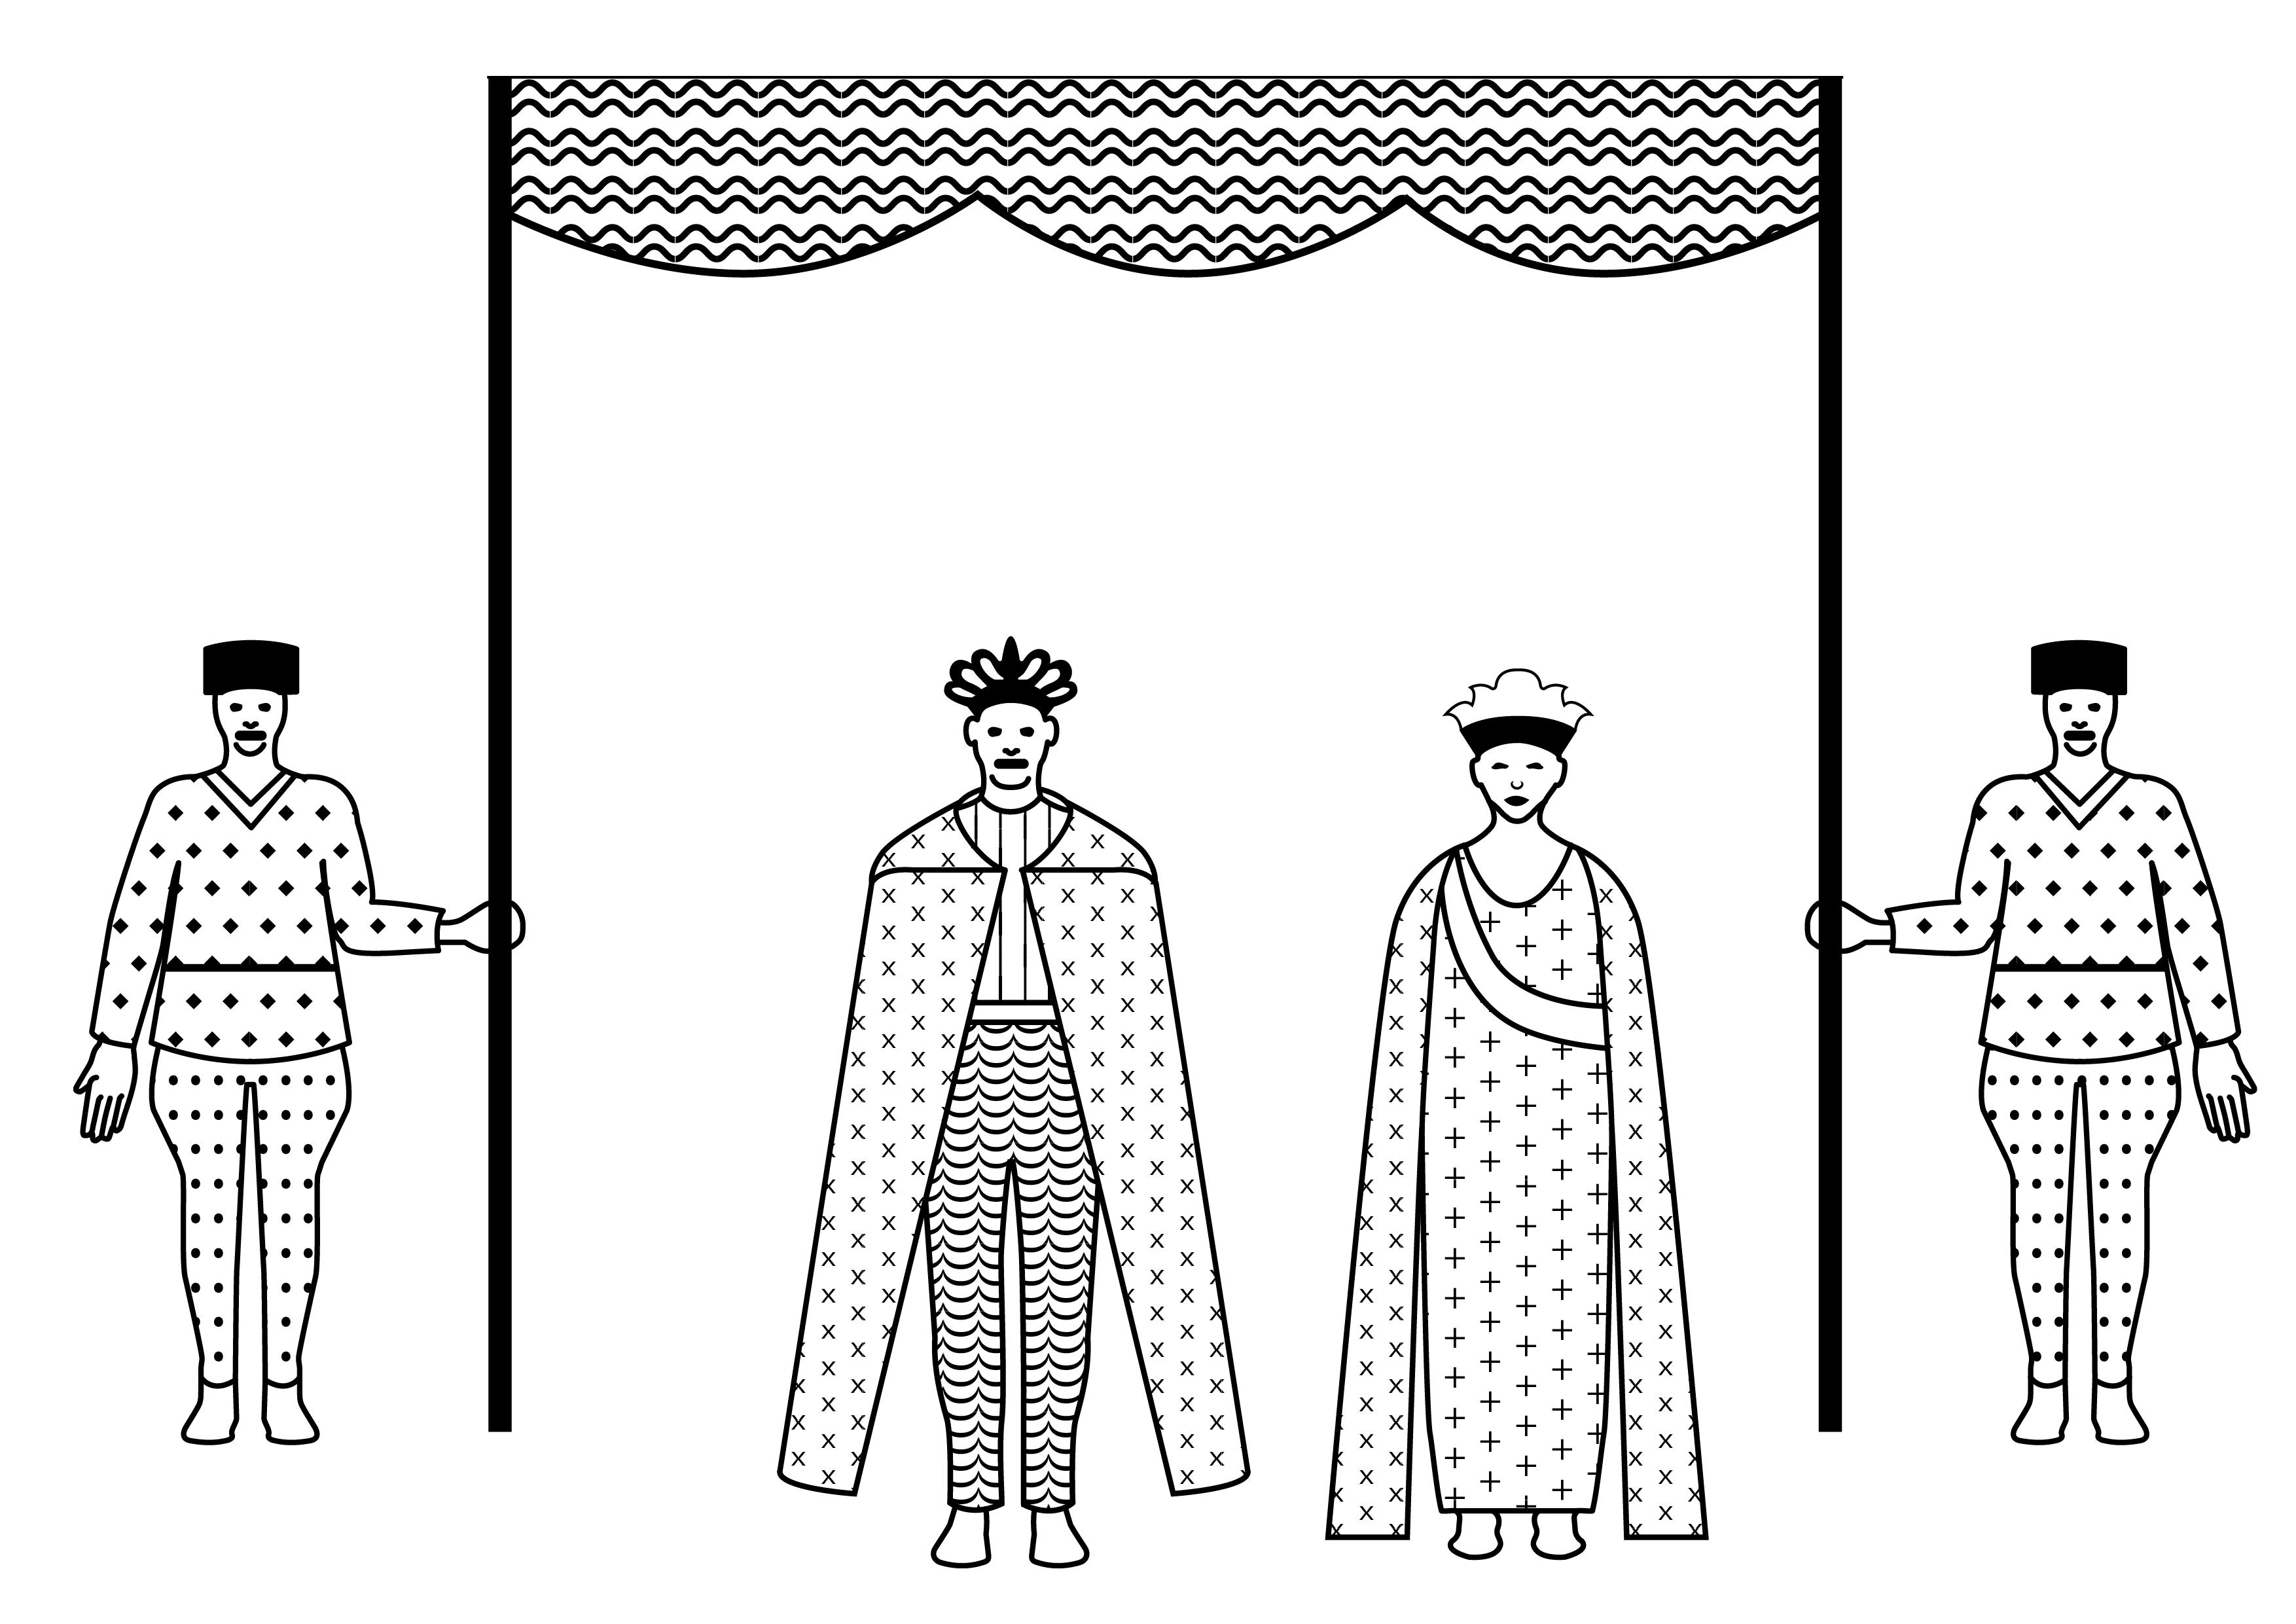 the coronation from alba iulia